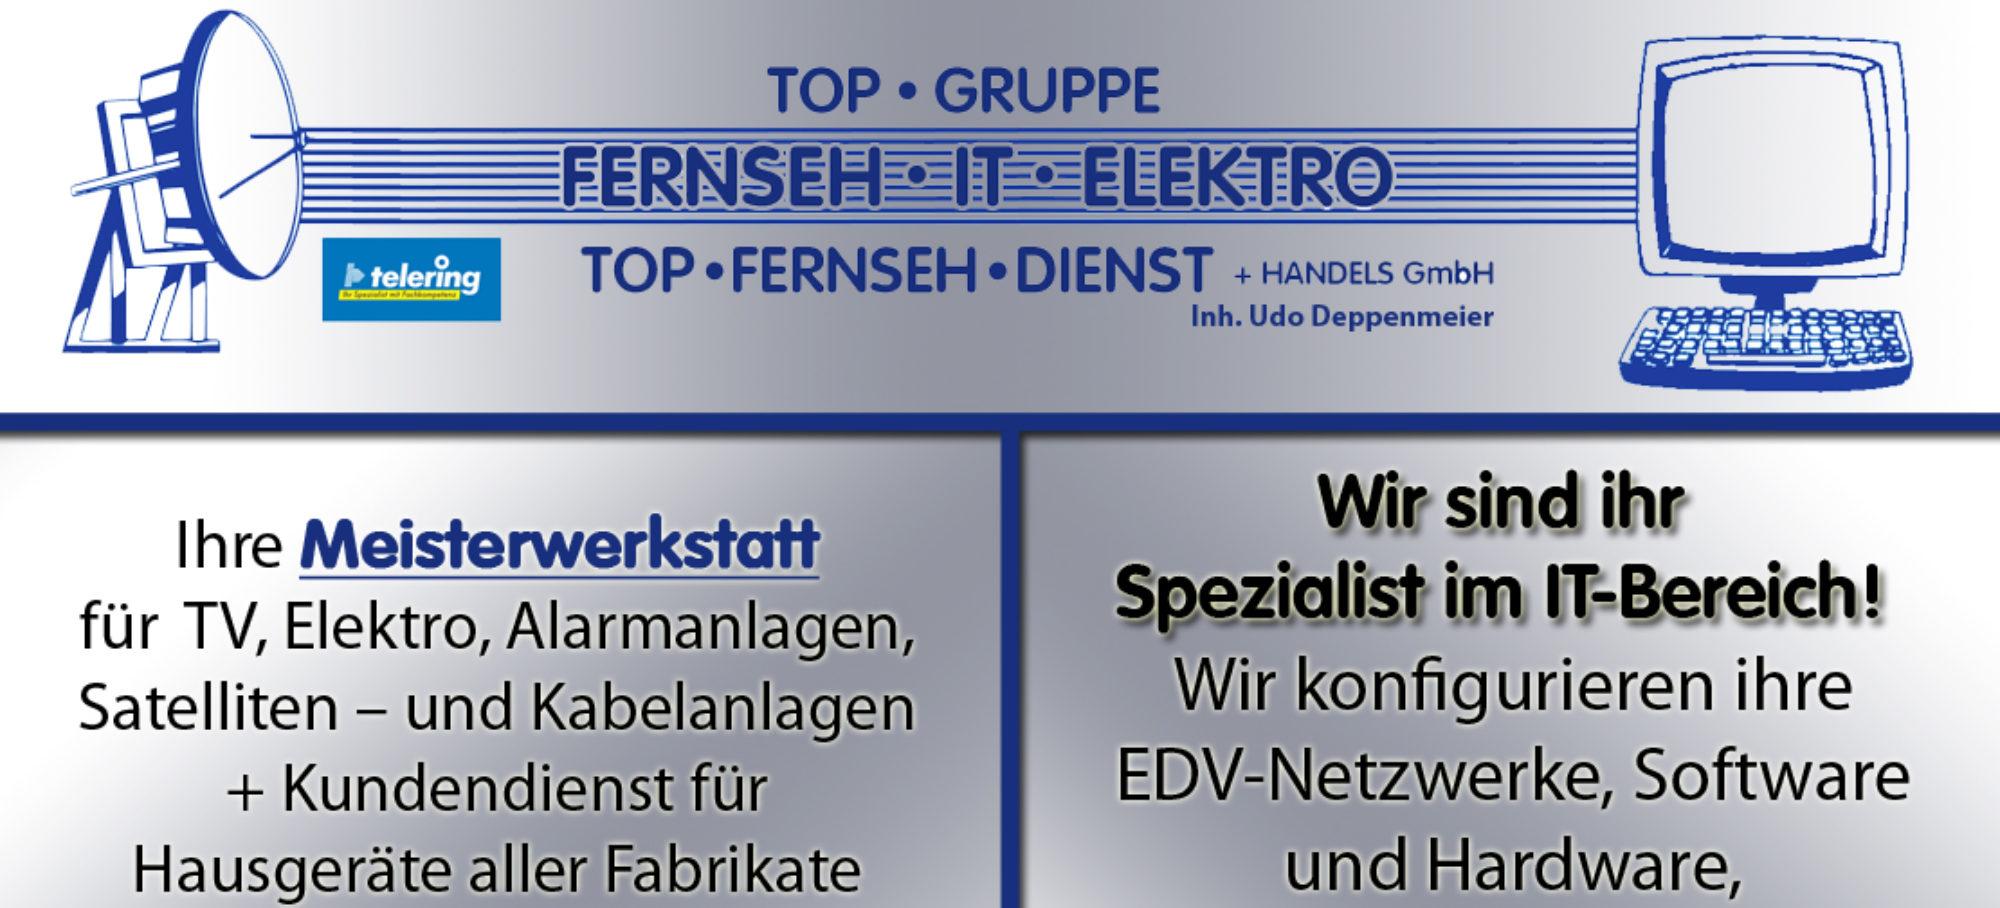 TOP-Gruppe